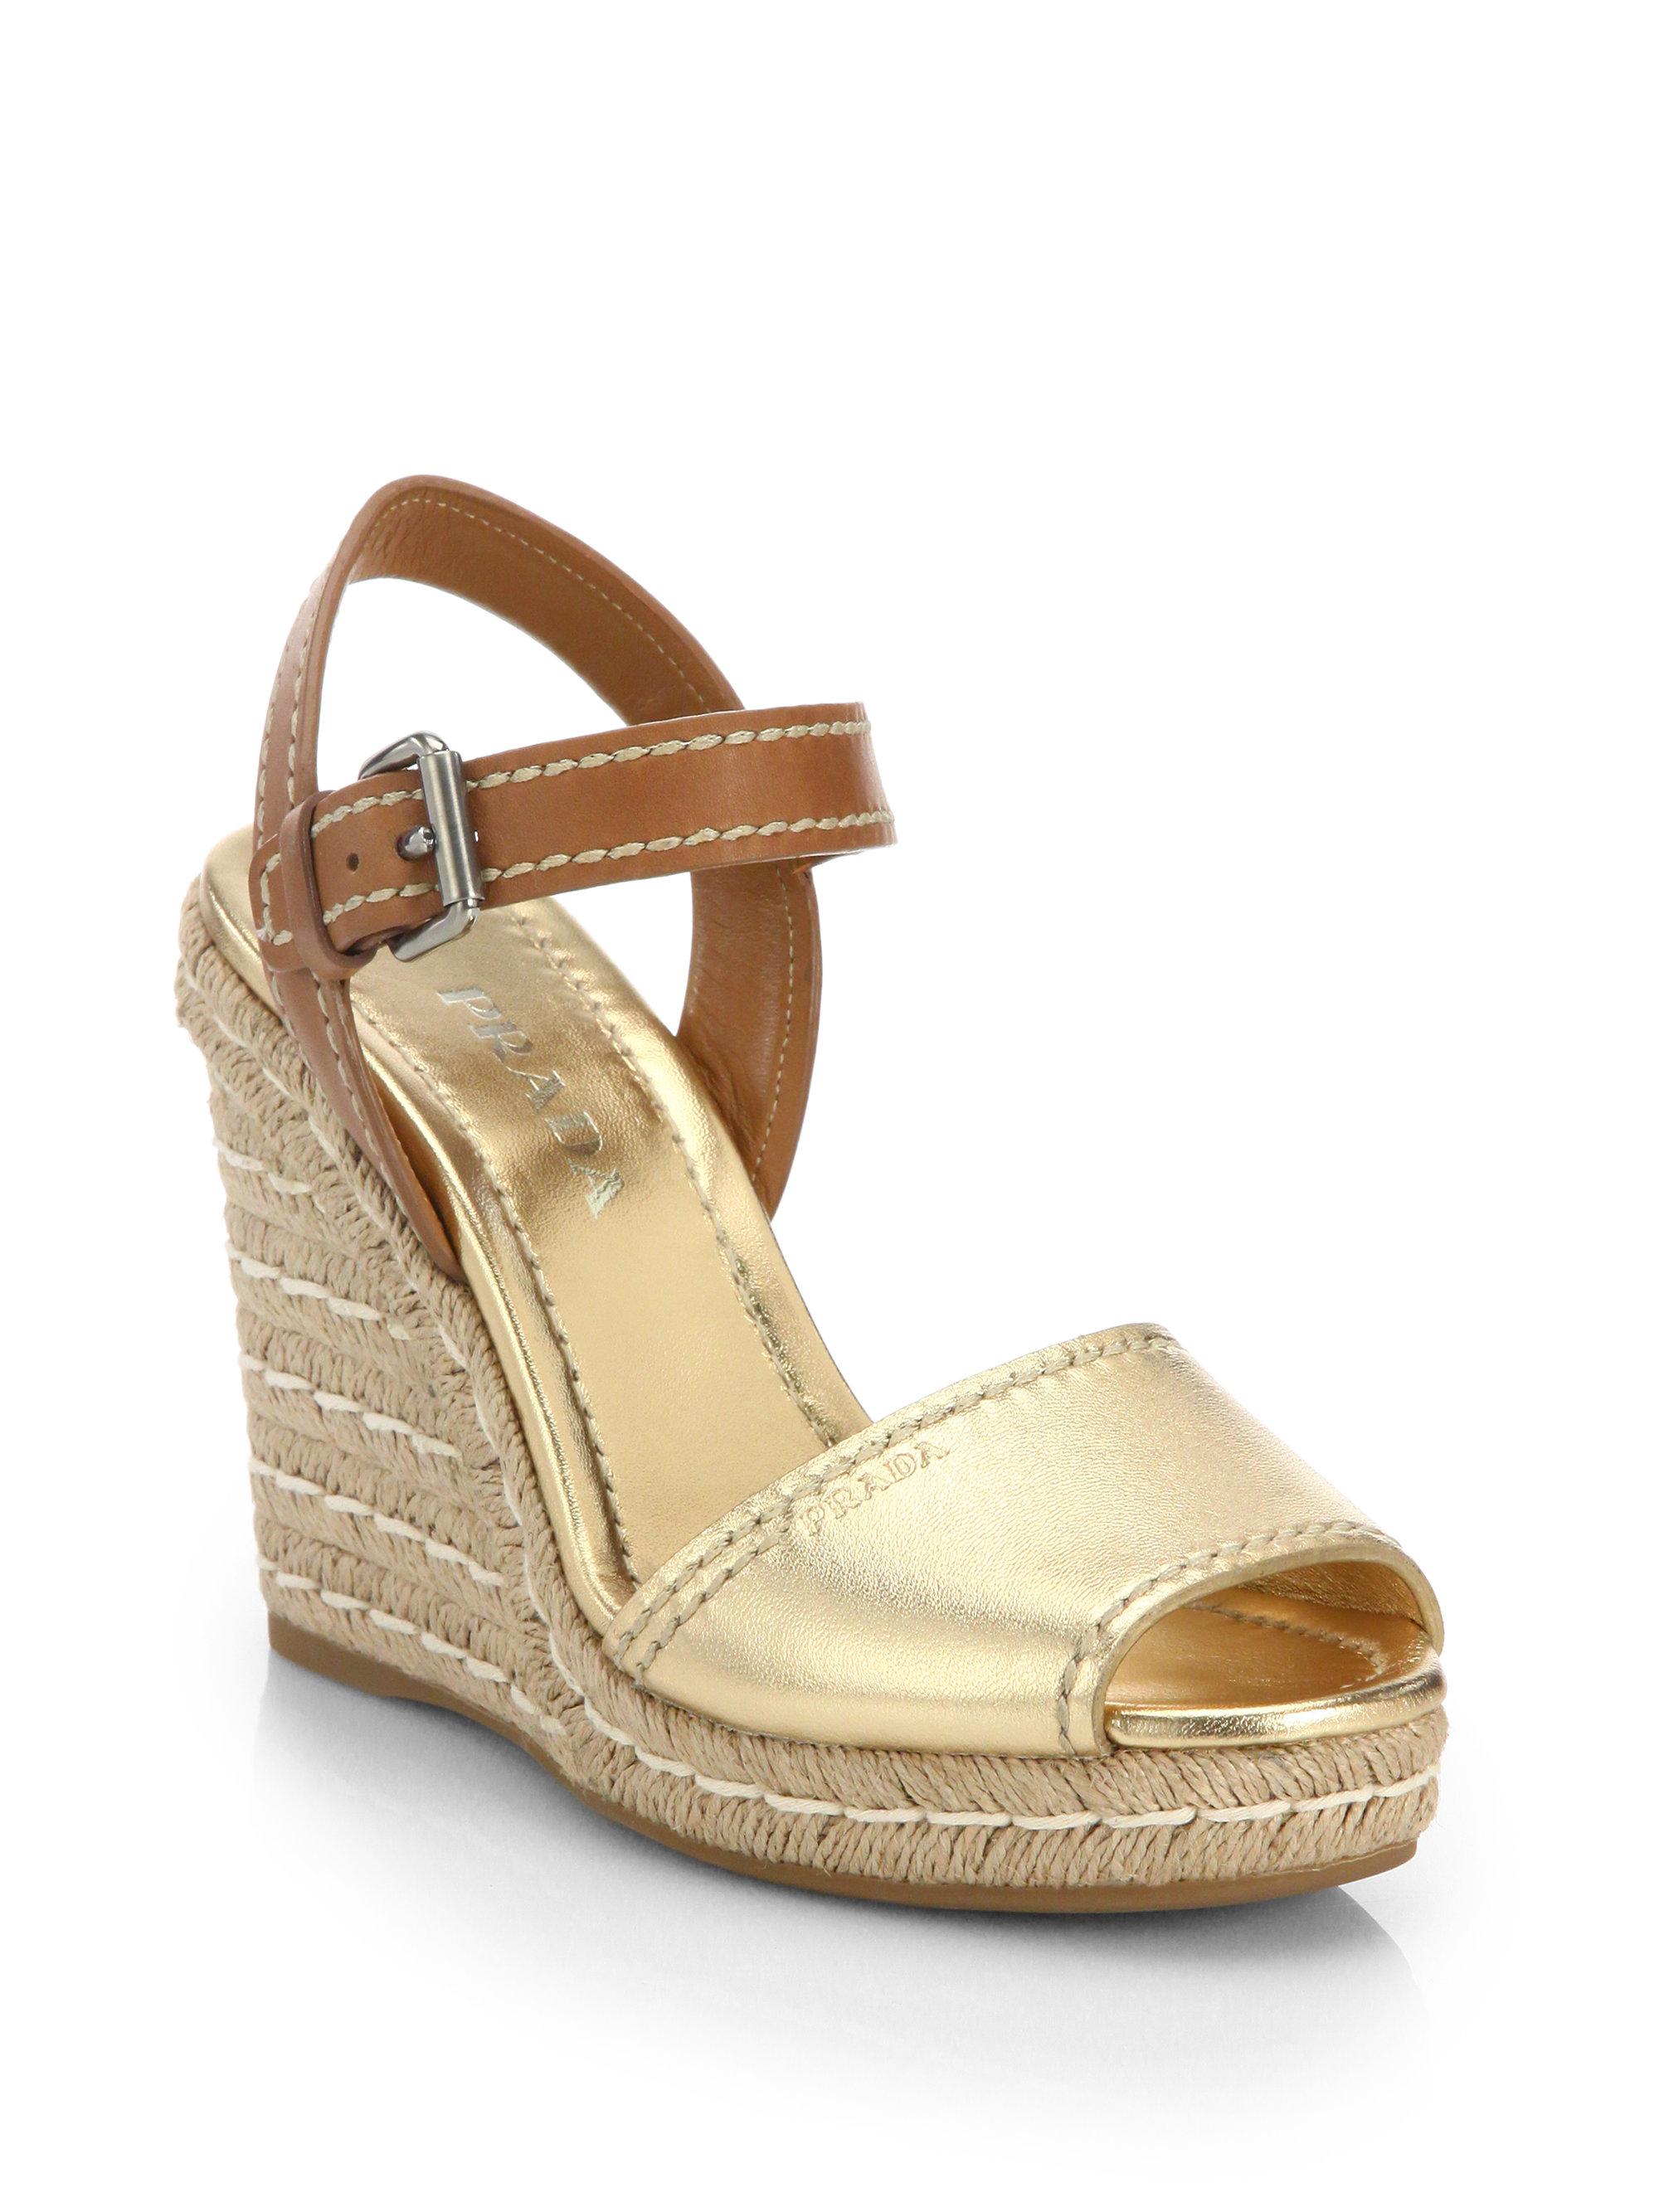 88674b649c4 Prada Natural Leather & Metallic Leather Espadrille Wedge Sandals